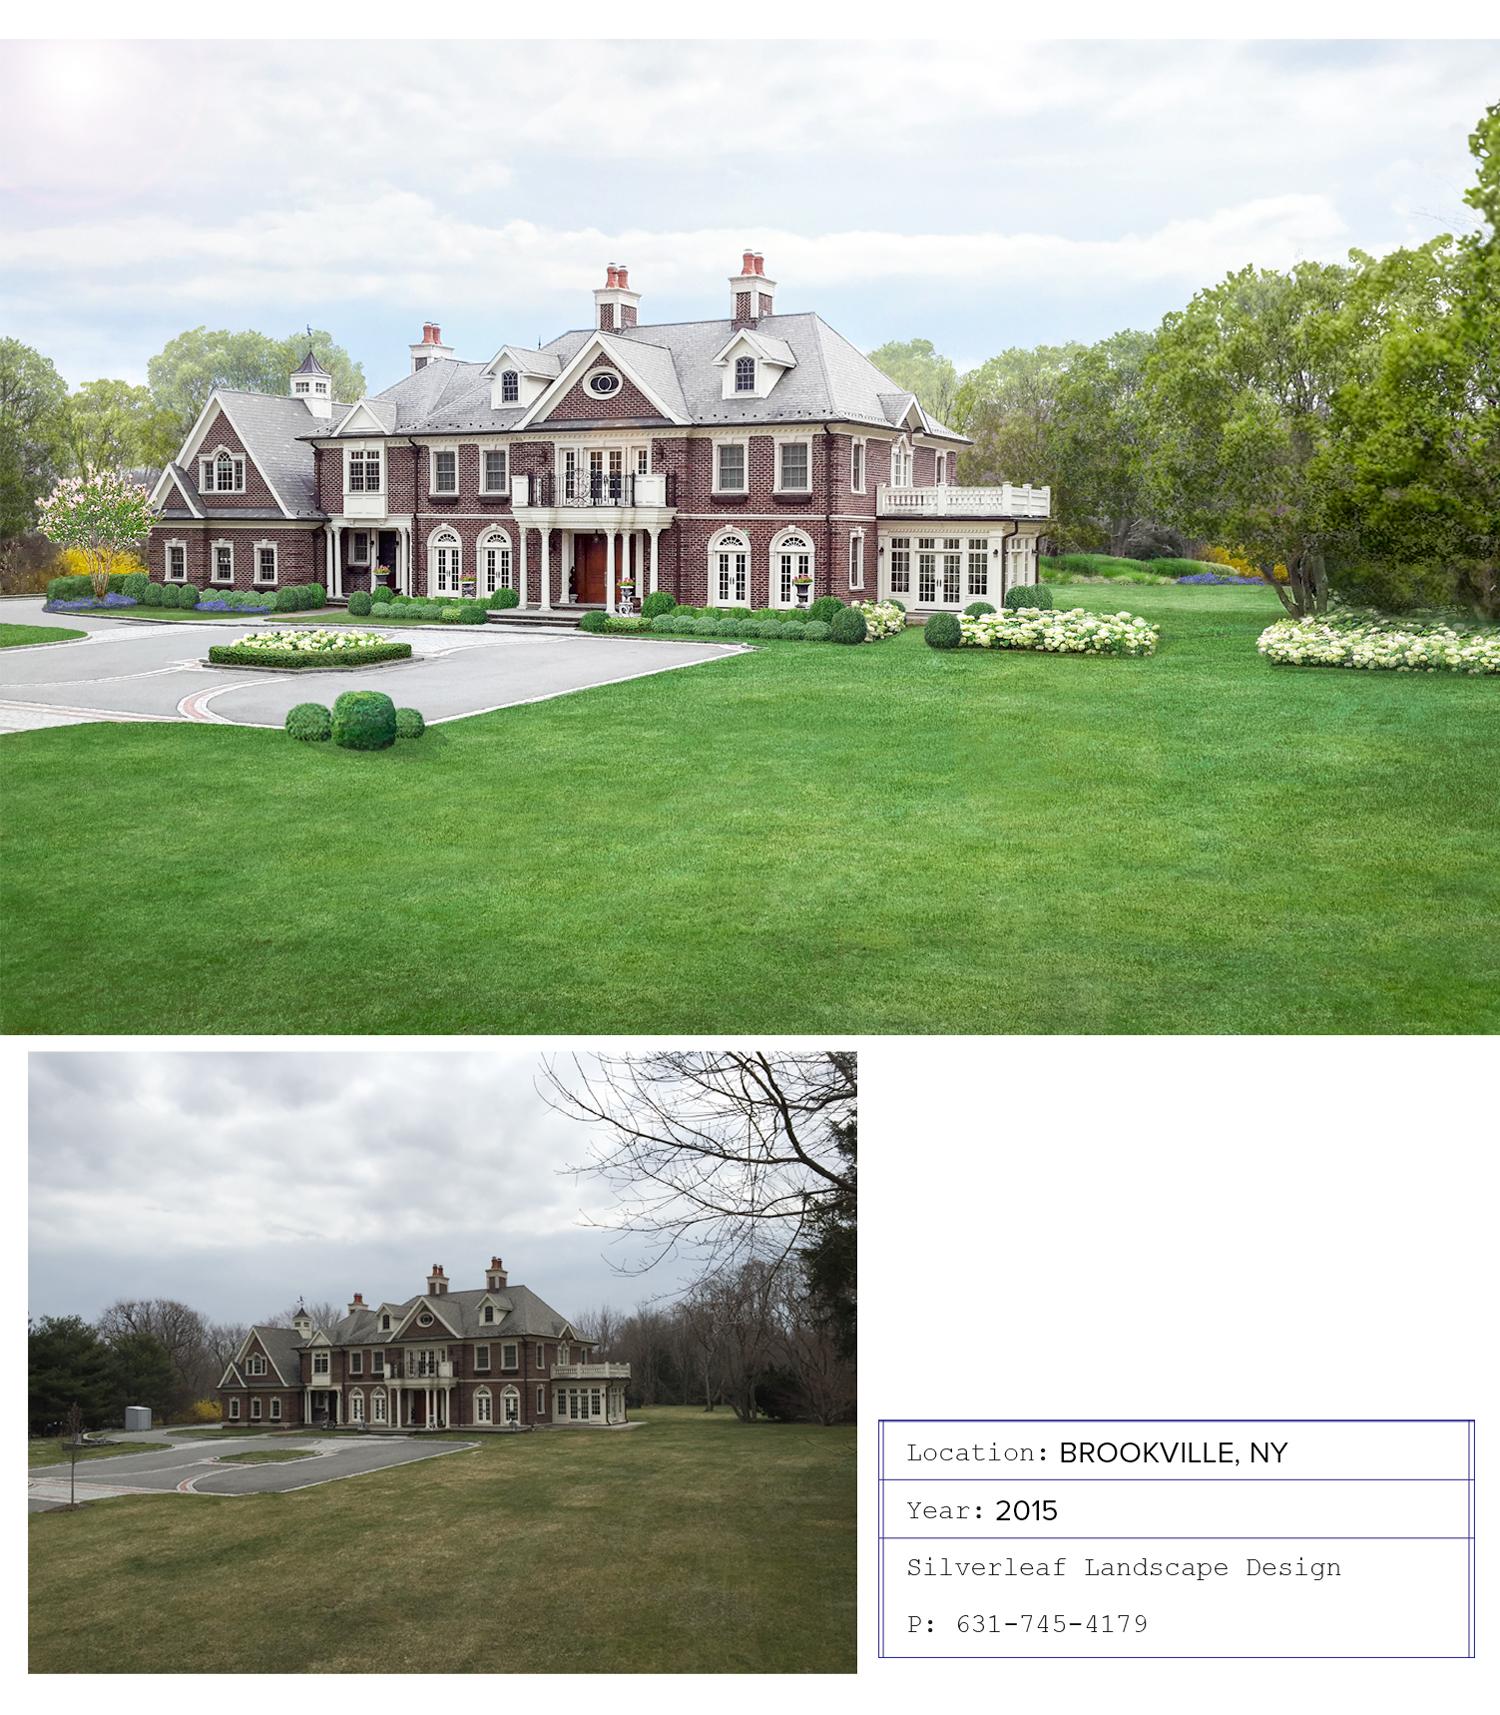 long_island_designer_rendering_landscape_best_review.jpg